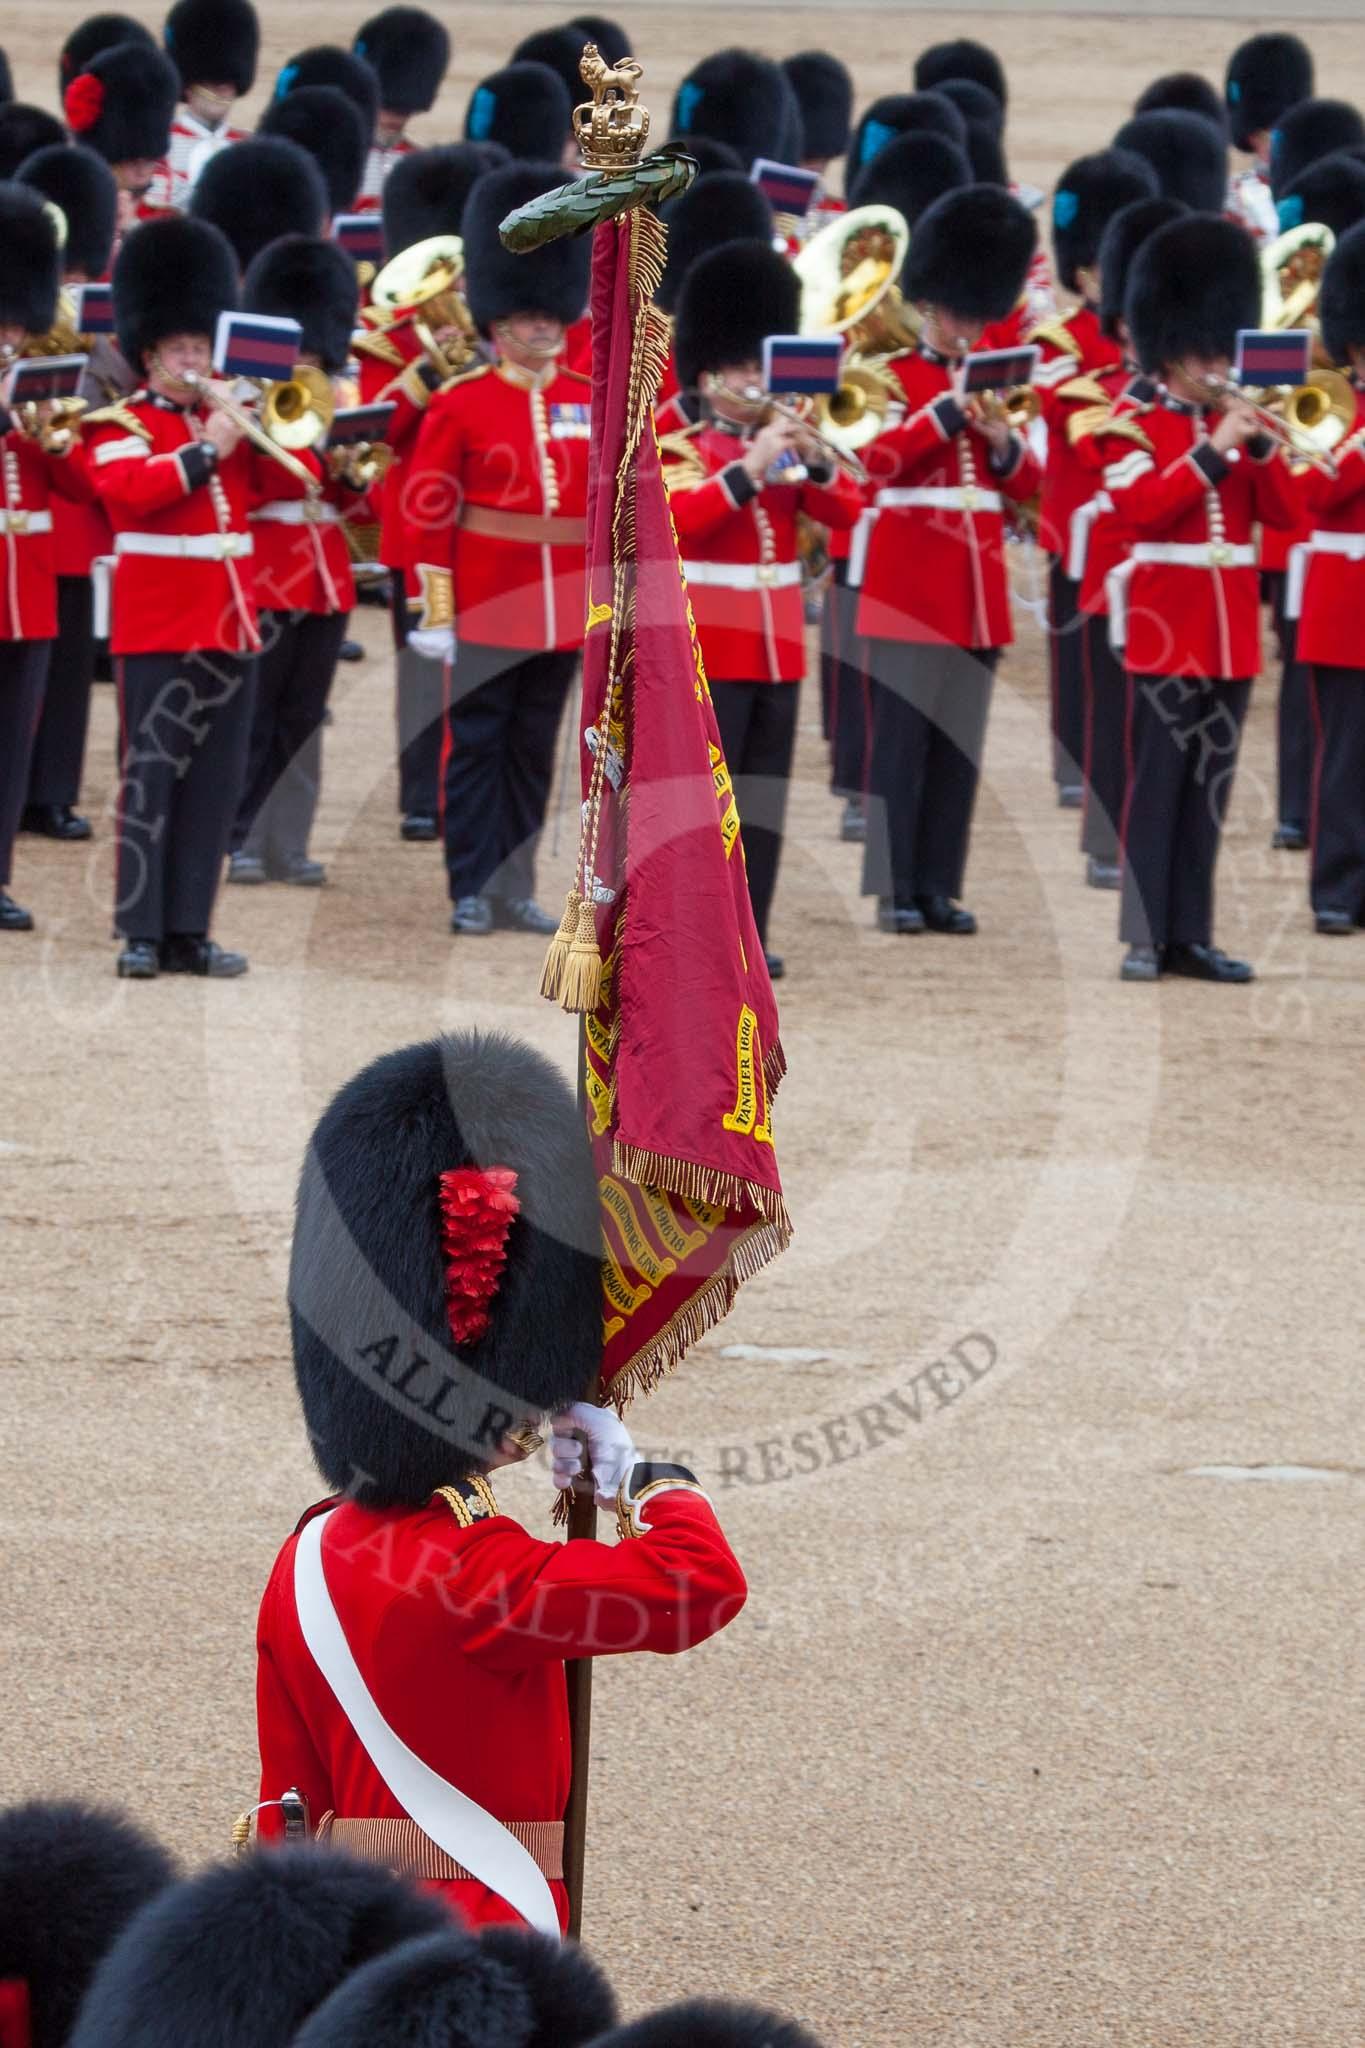 Queen's Birthday Parade 2012 - Trooping the Colour Photos ...